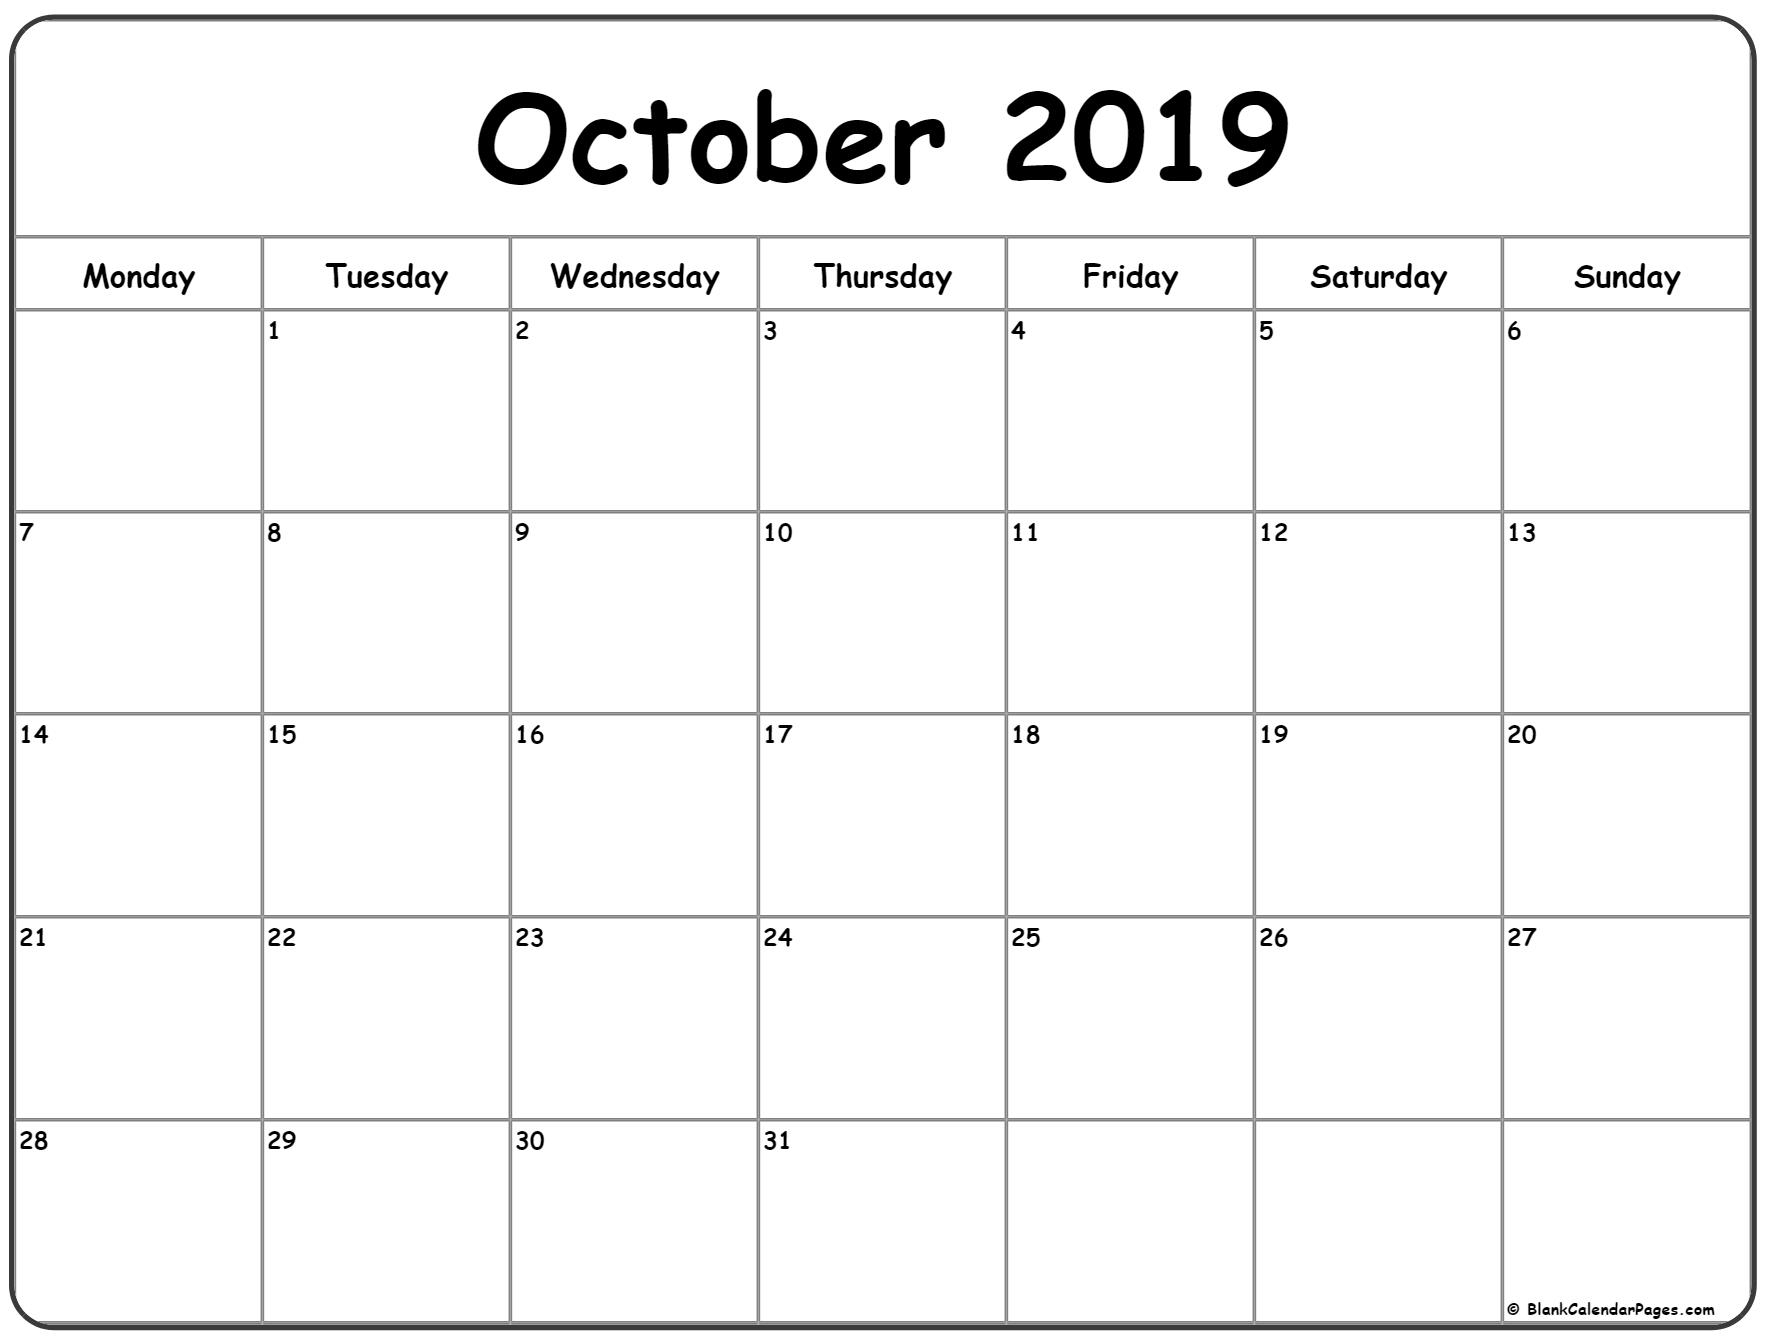 October 2019 Monday Calendar | Monday To Sunday